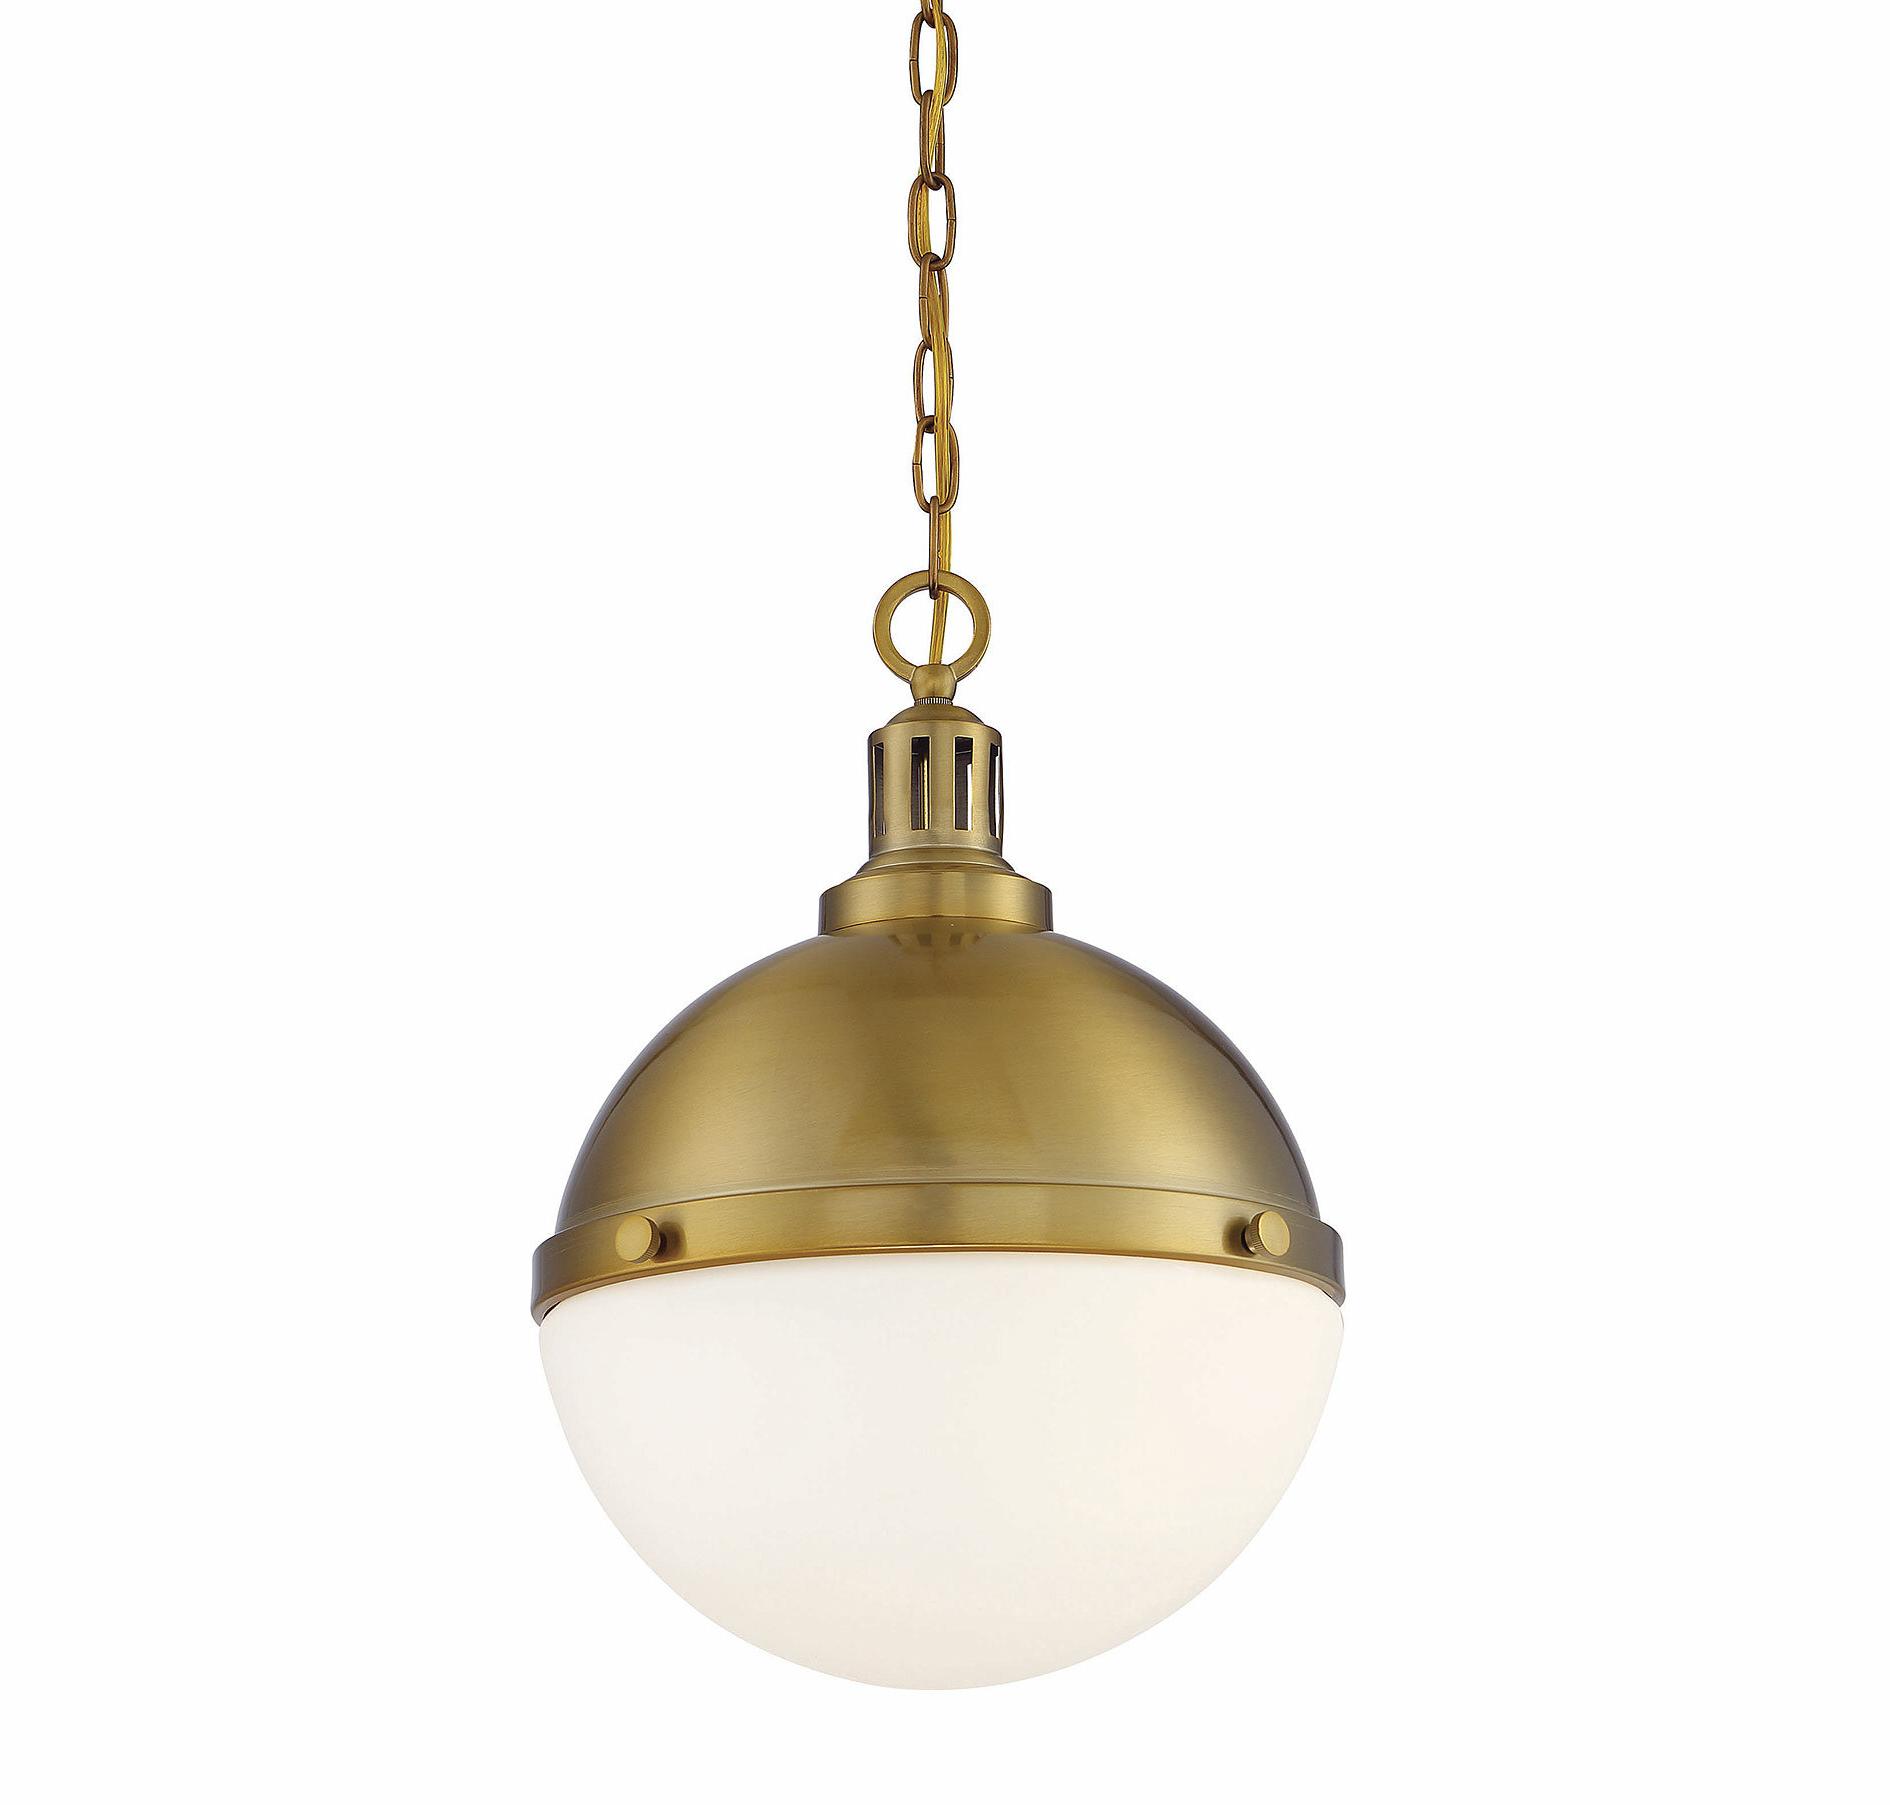 Most Popular Landrum 2 Light Single Globe Pendant Regarding Amara 2 Light Dome Pendants (View 5 of 25)